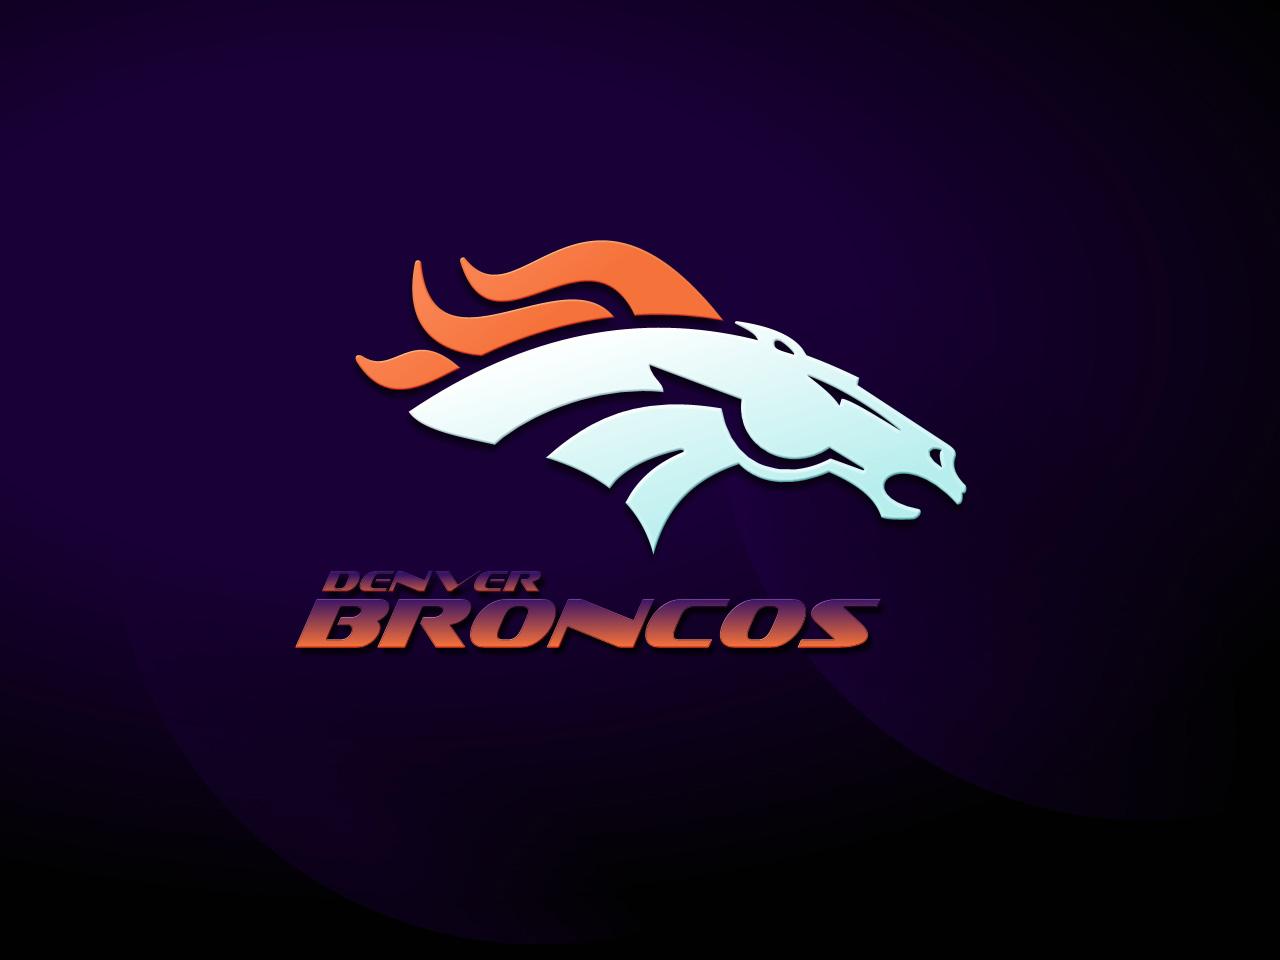 Broncos logo wallpaper wallpapersafari - Cool broncos wallpapers ...